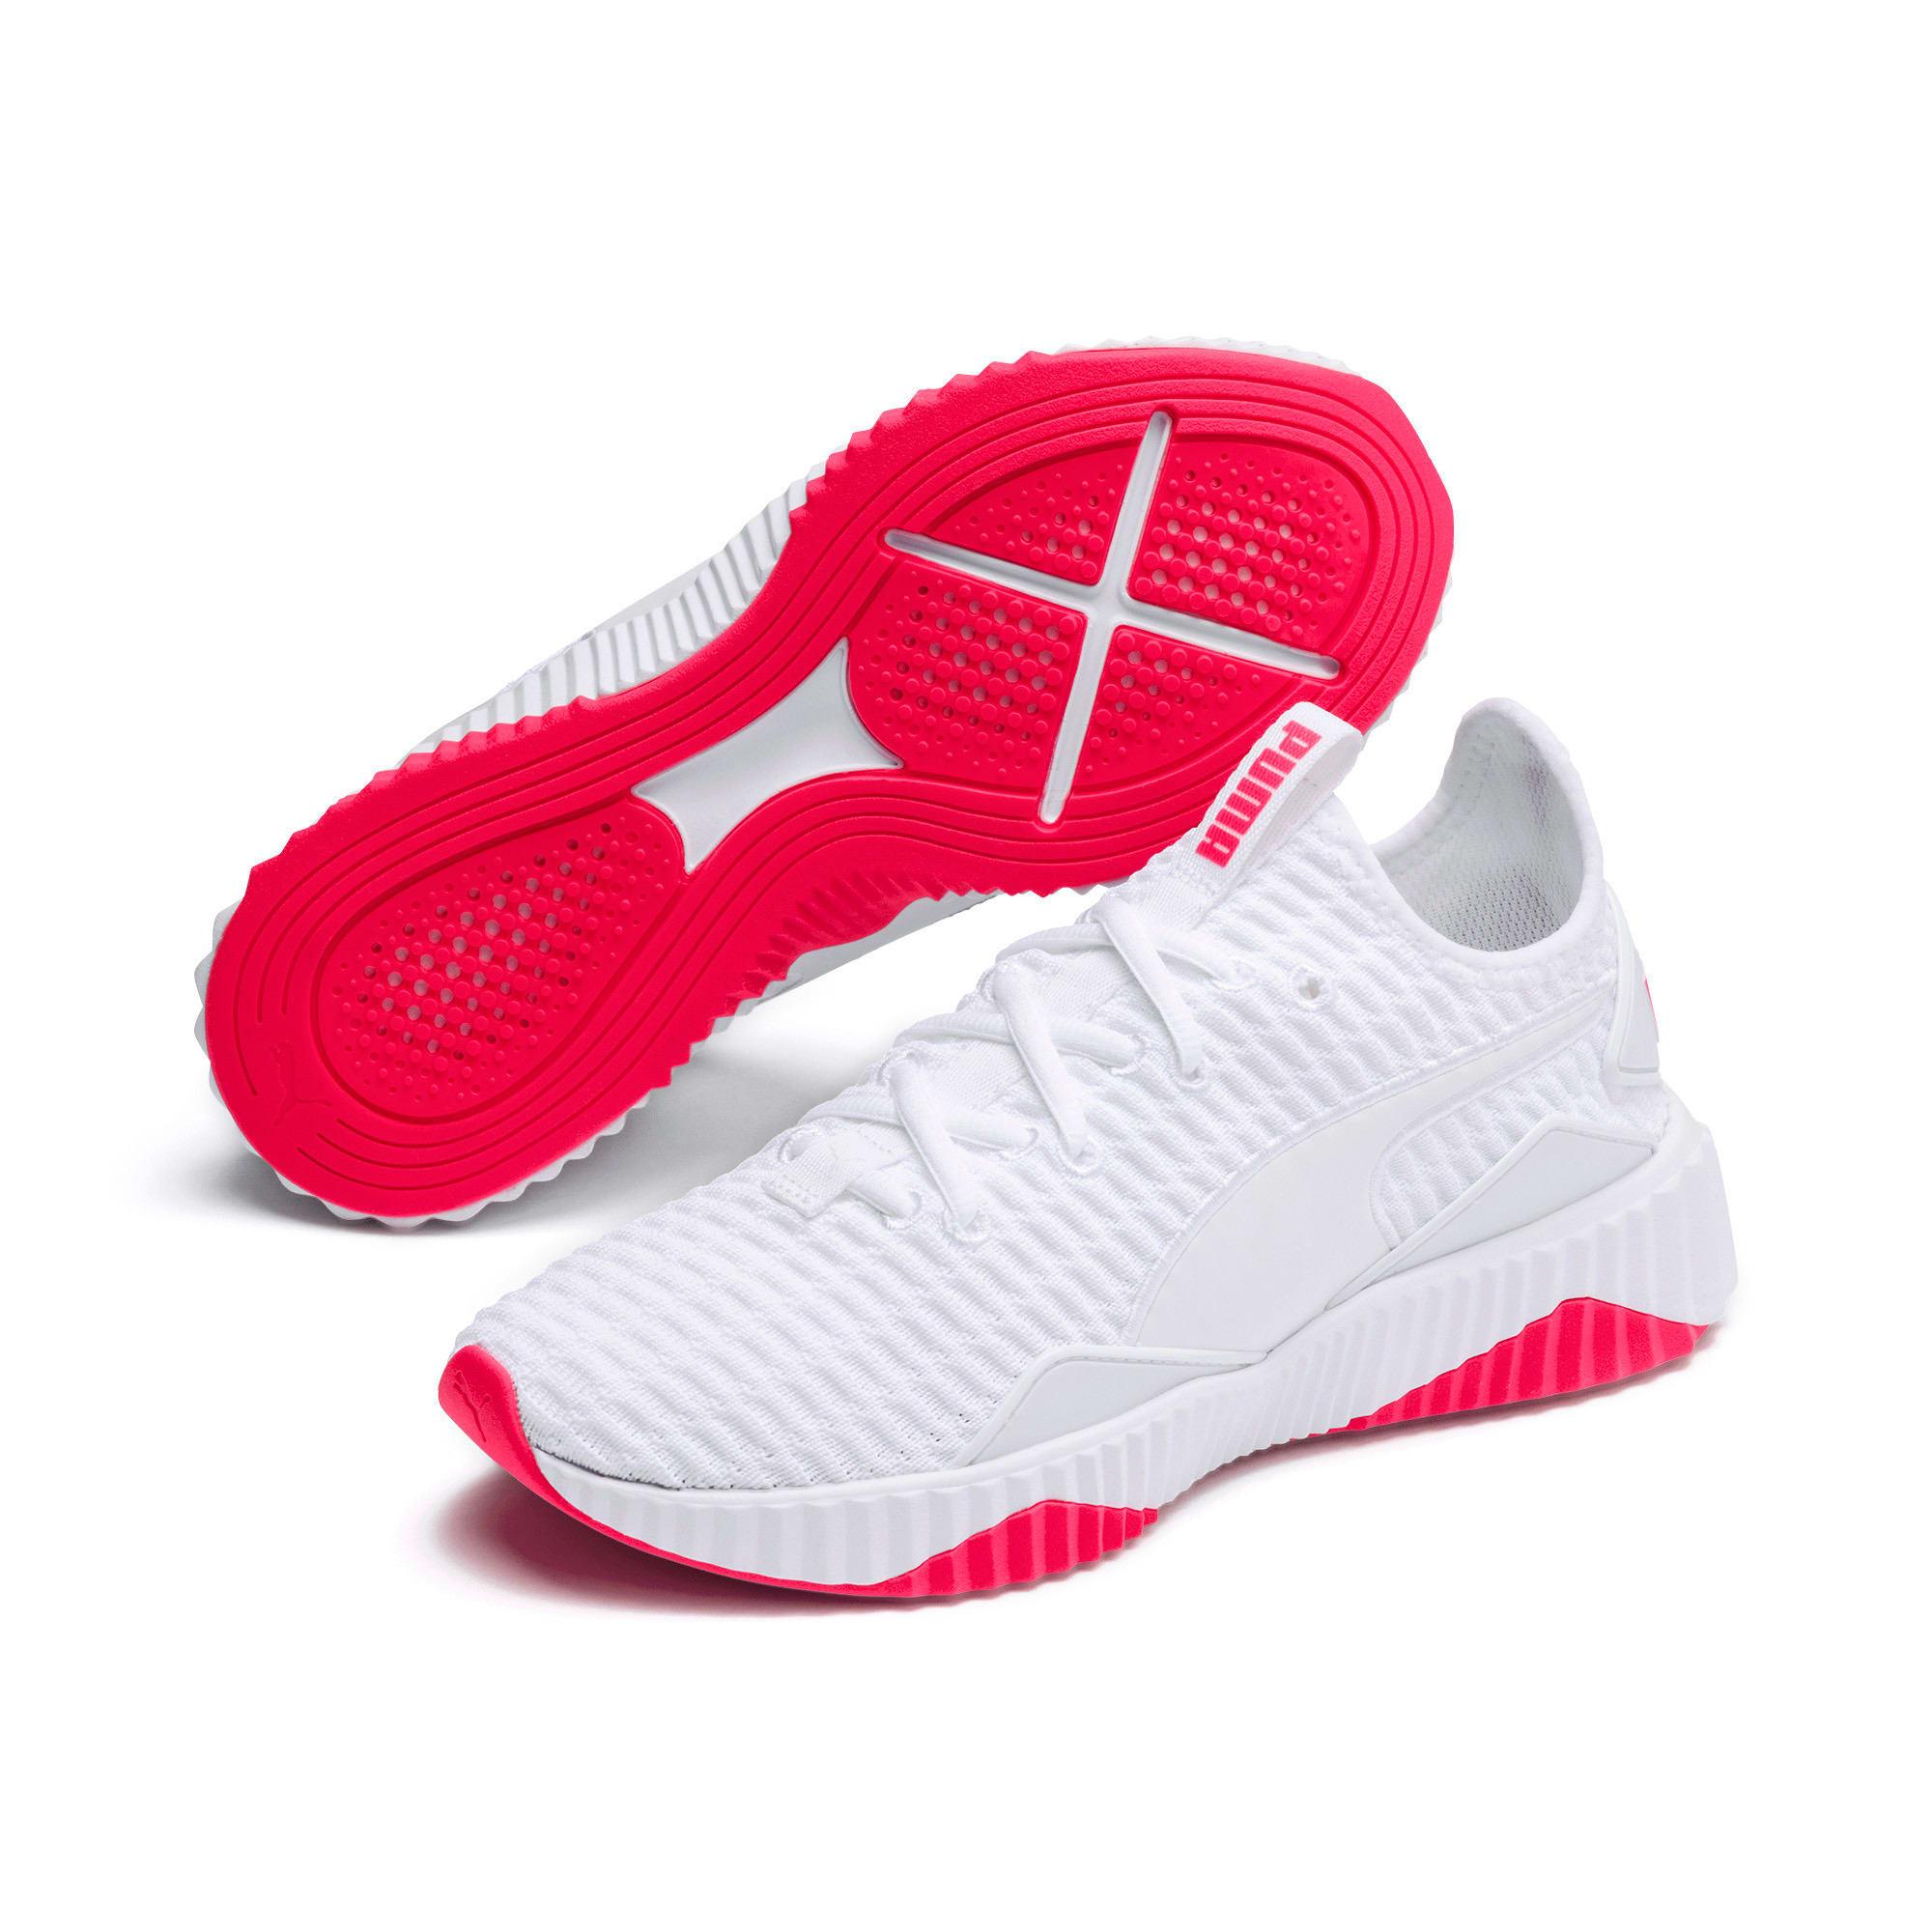 Thumbnail 3 of Defy Damen Sneaker, Puma White-Pink Alert, medium